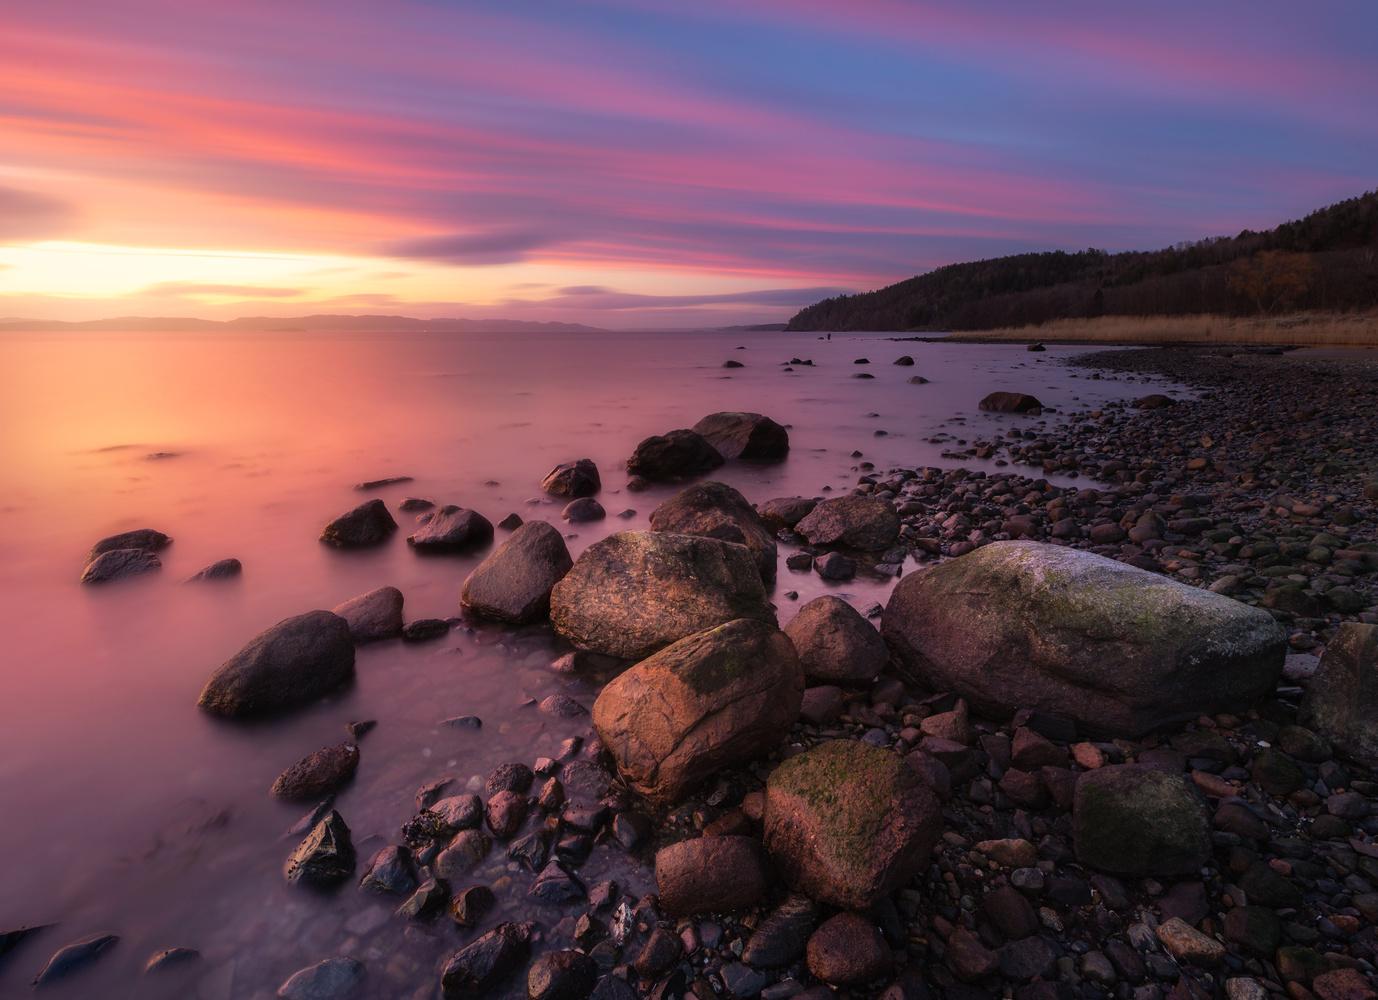 Refsnes beach by Mikkel Nordbæk